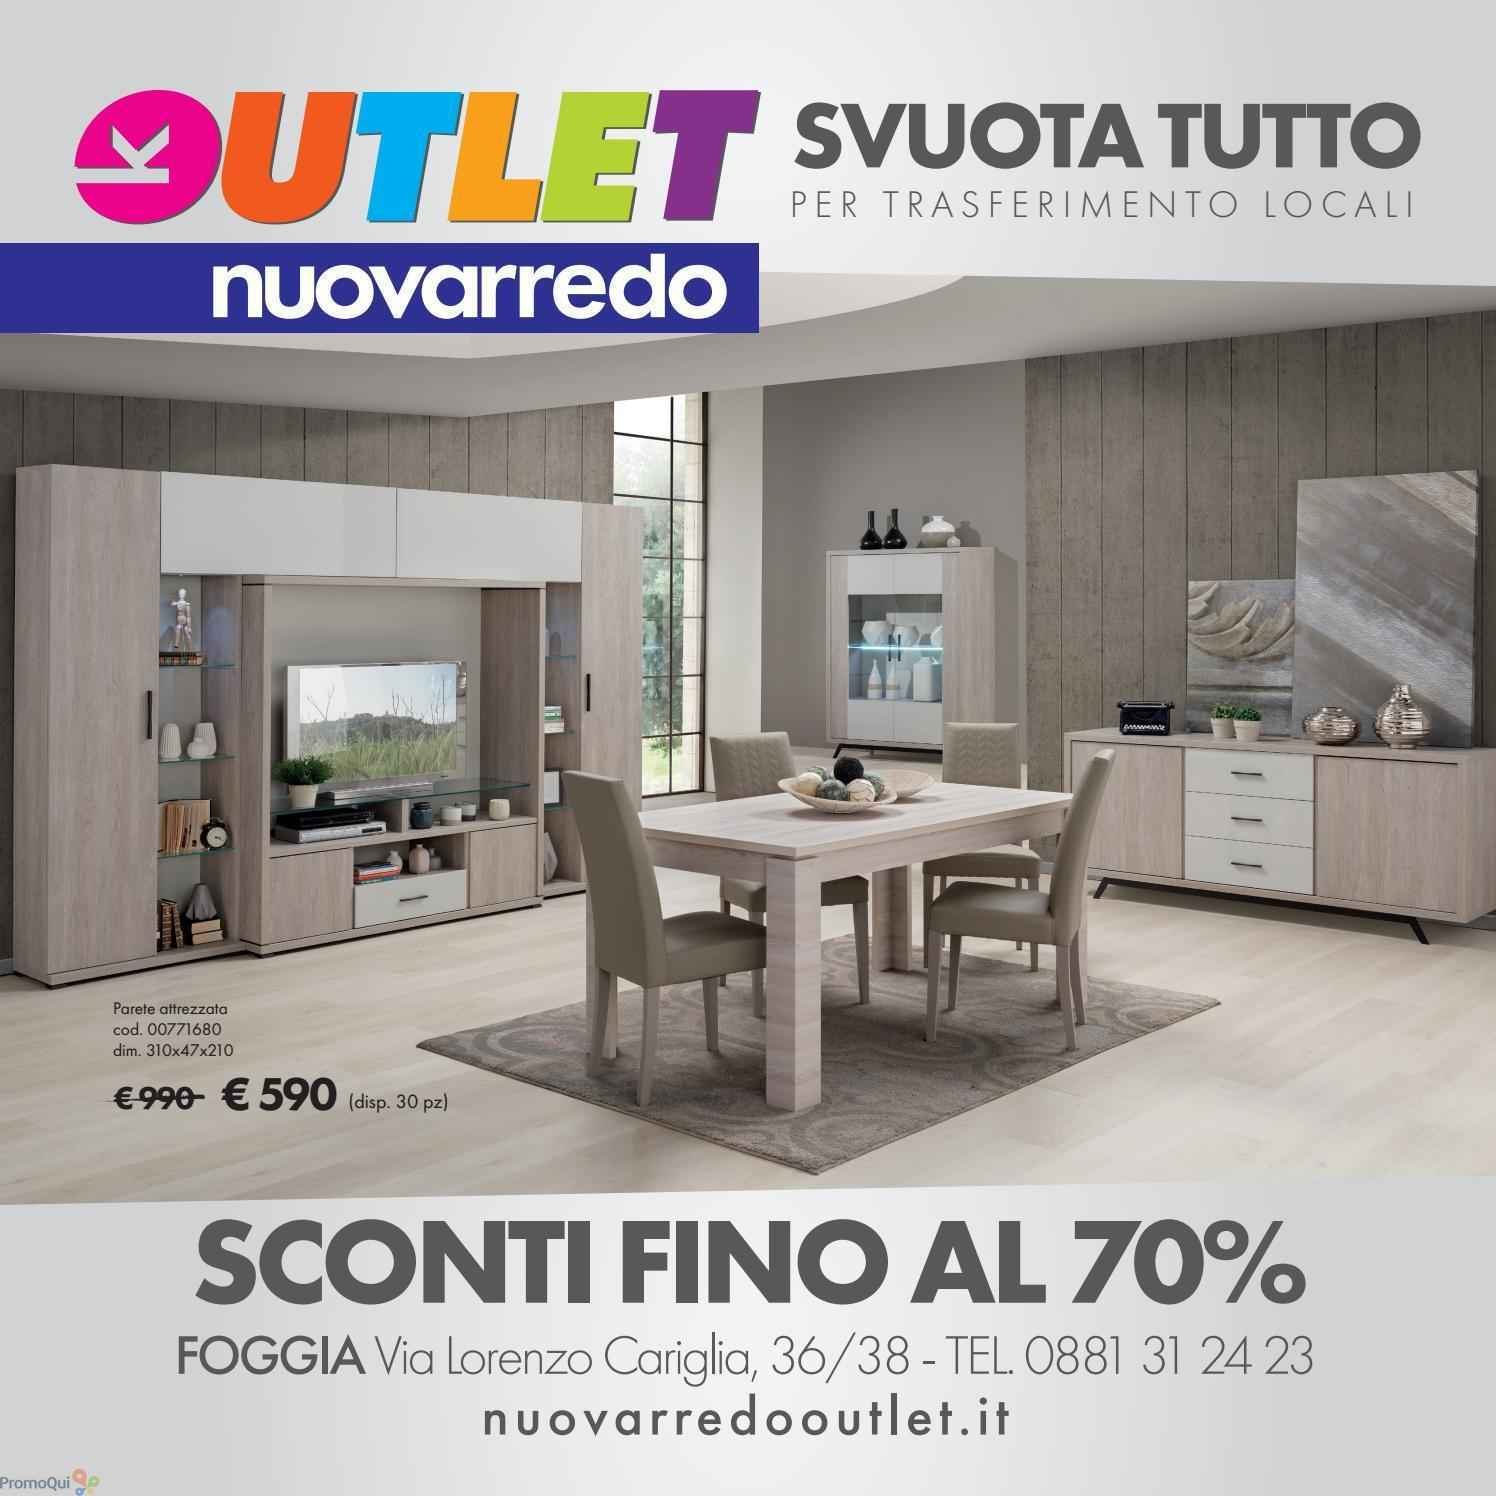 Nuovarredo molfetta catalogo danae with nuovarredo for Nuovo arredo surano